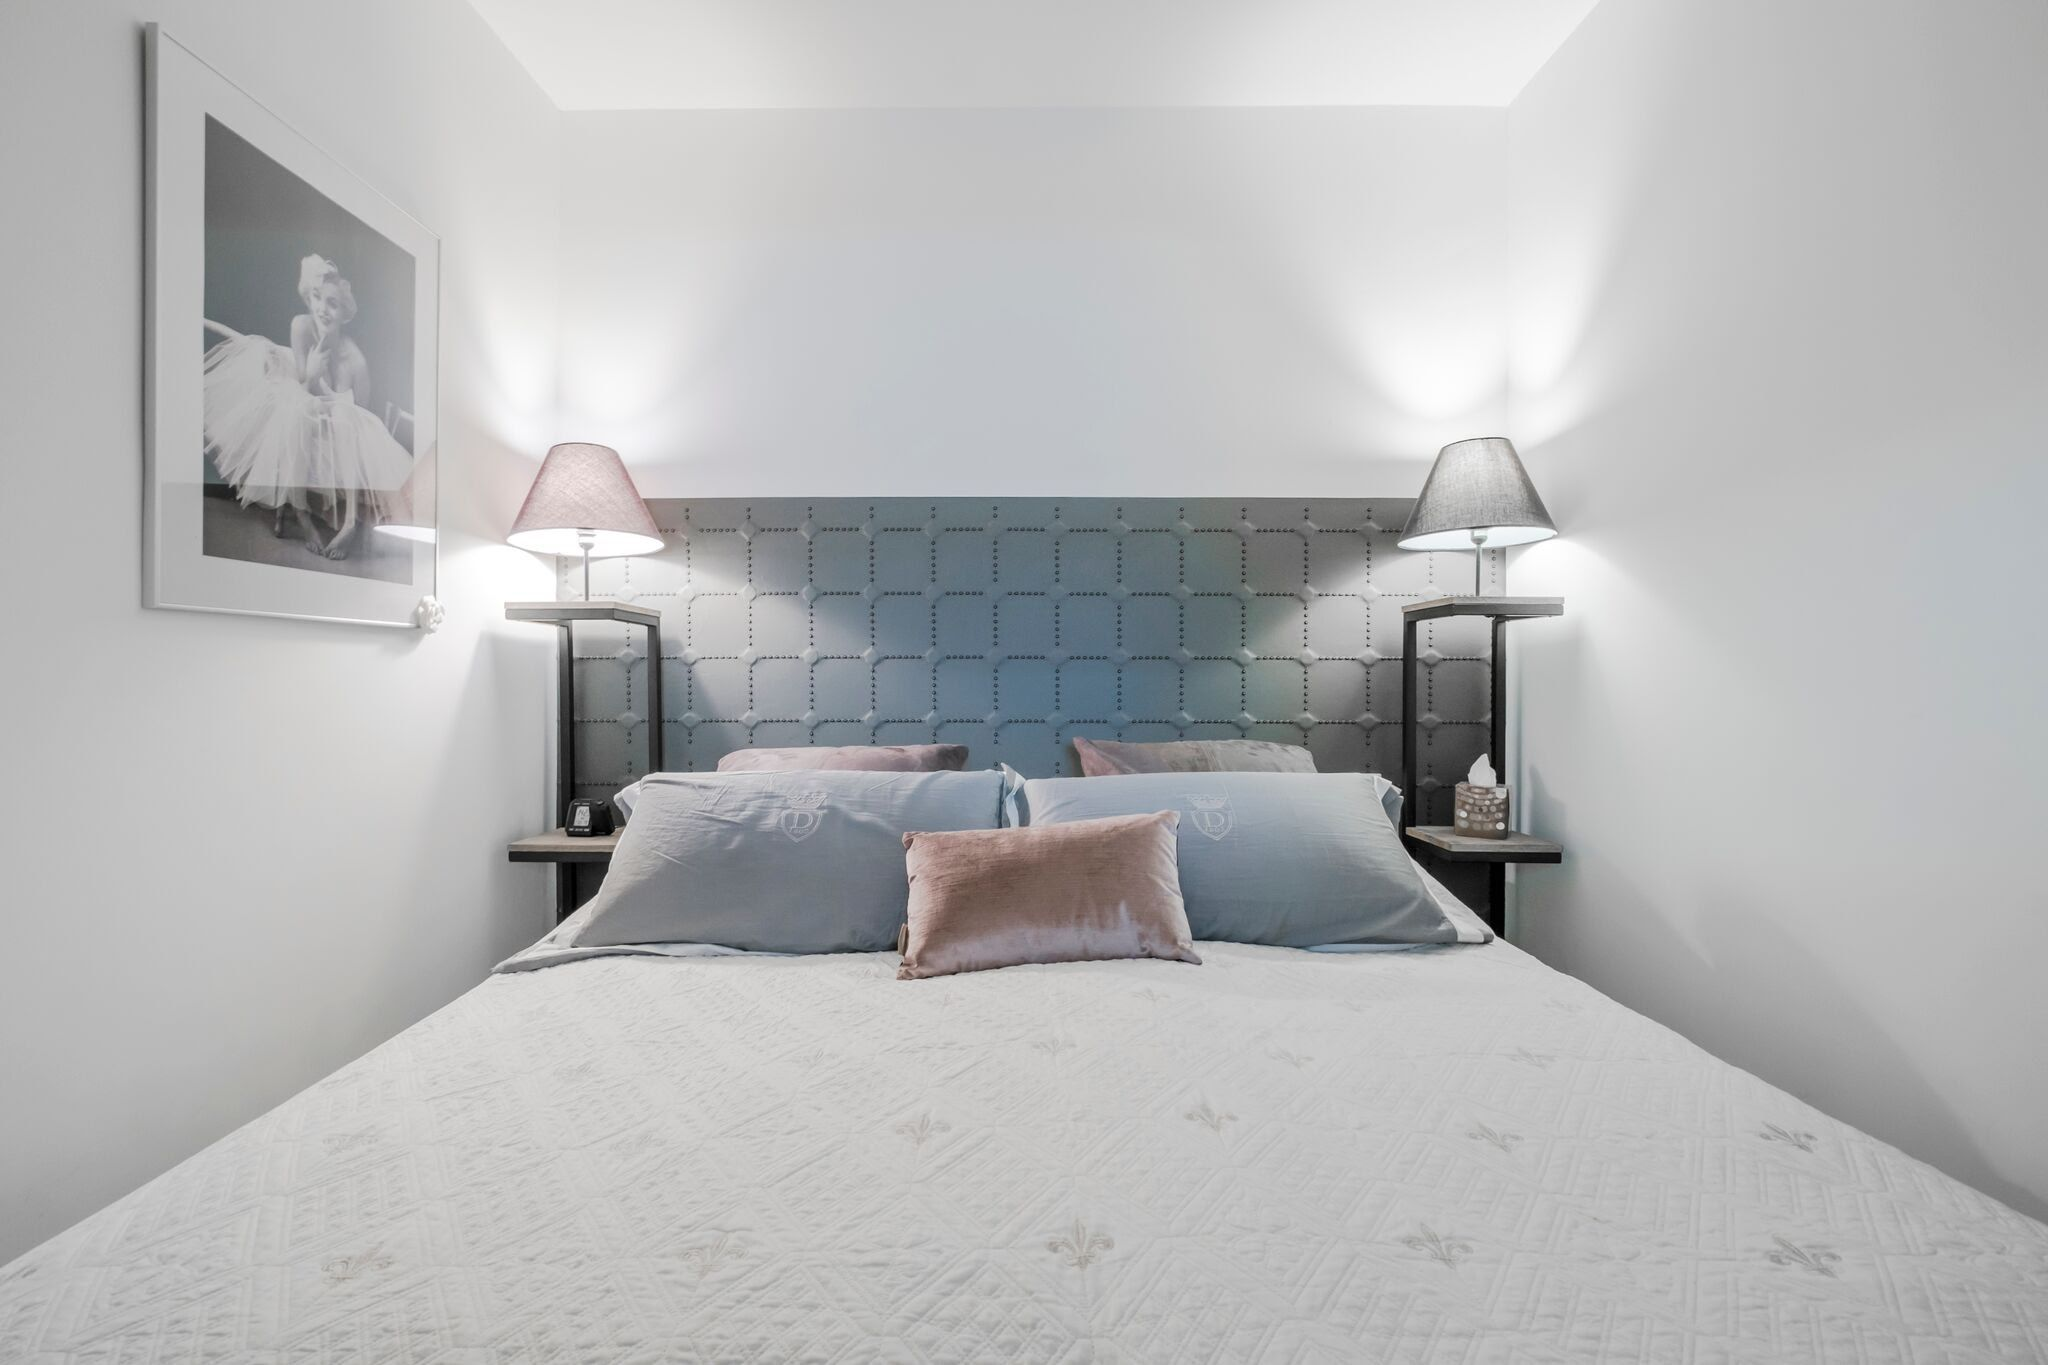 Mini Espace Chambre 7m2 Deco Petit Appartement Deco Chambre Idee De Decoration